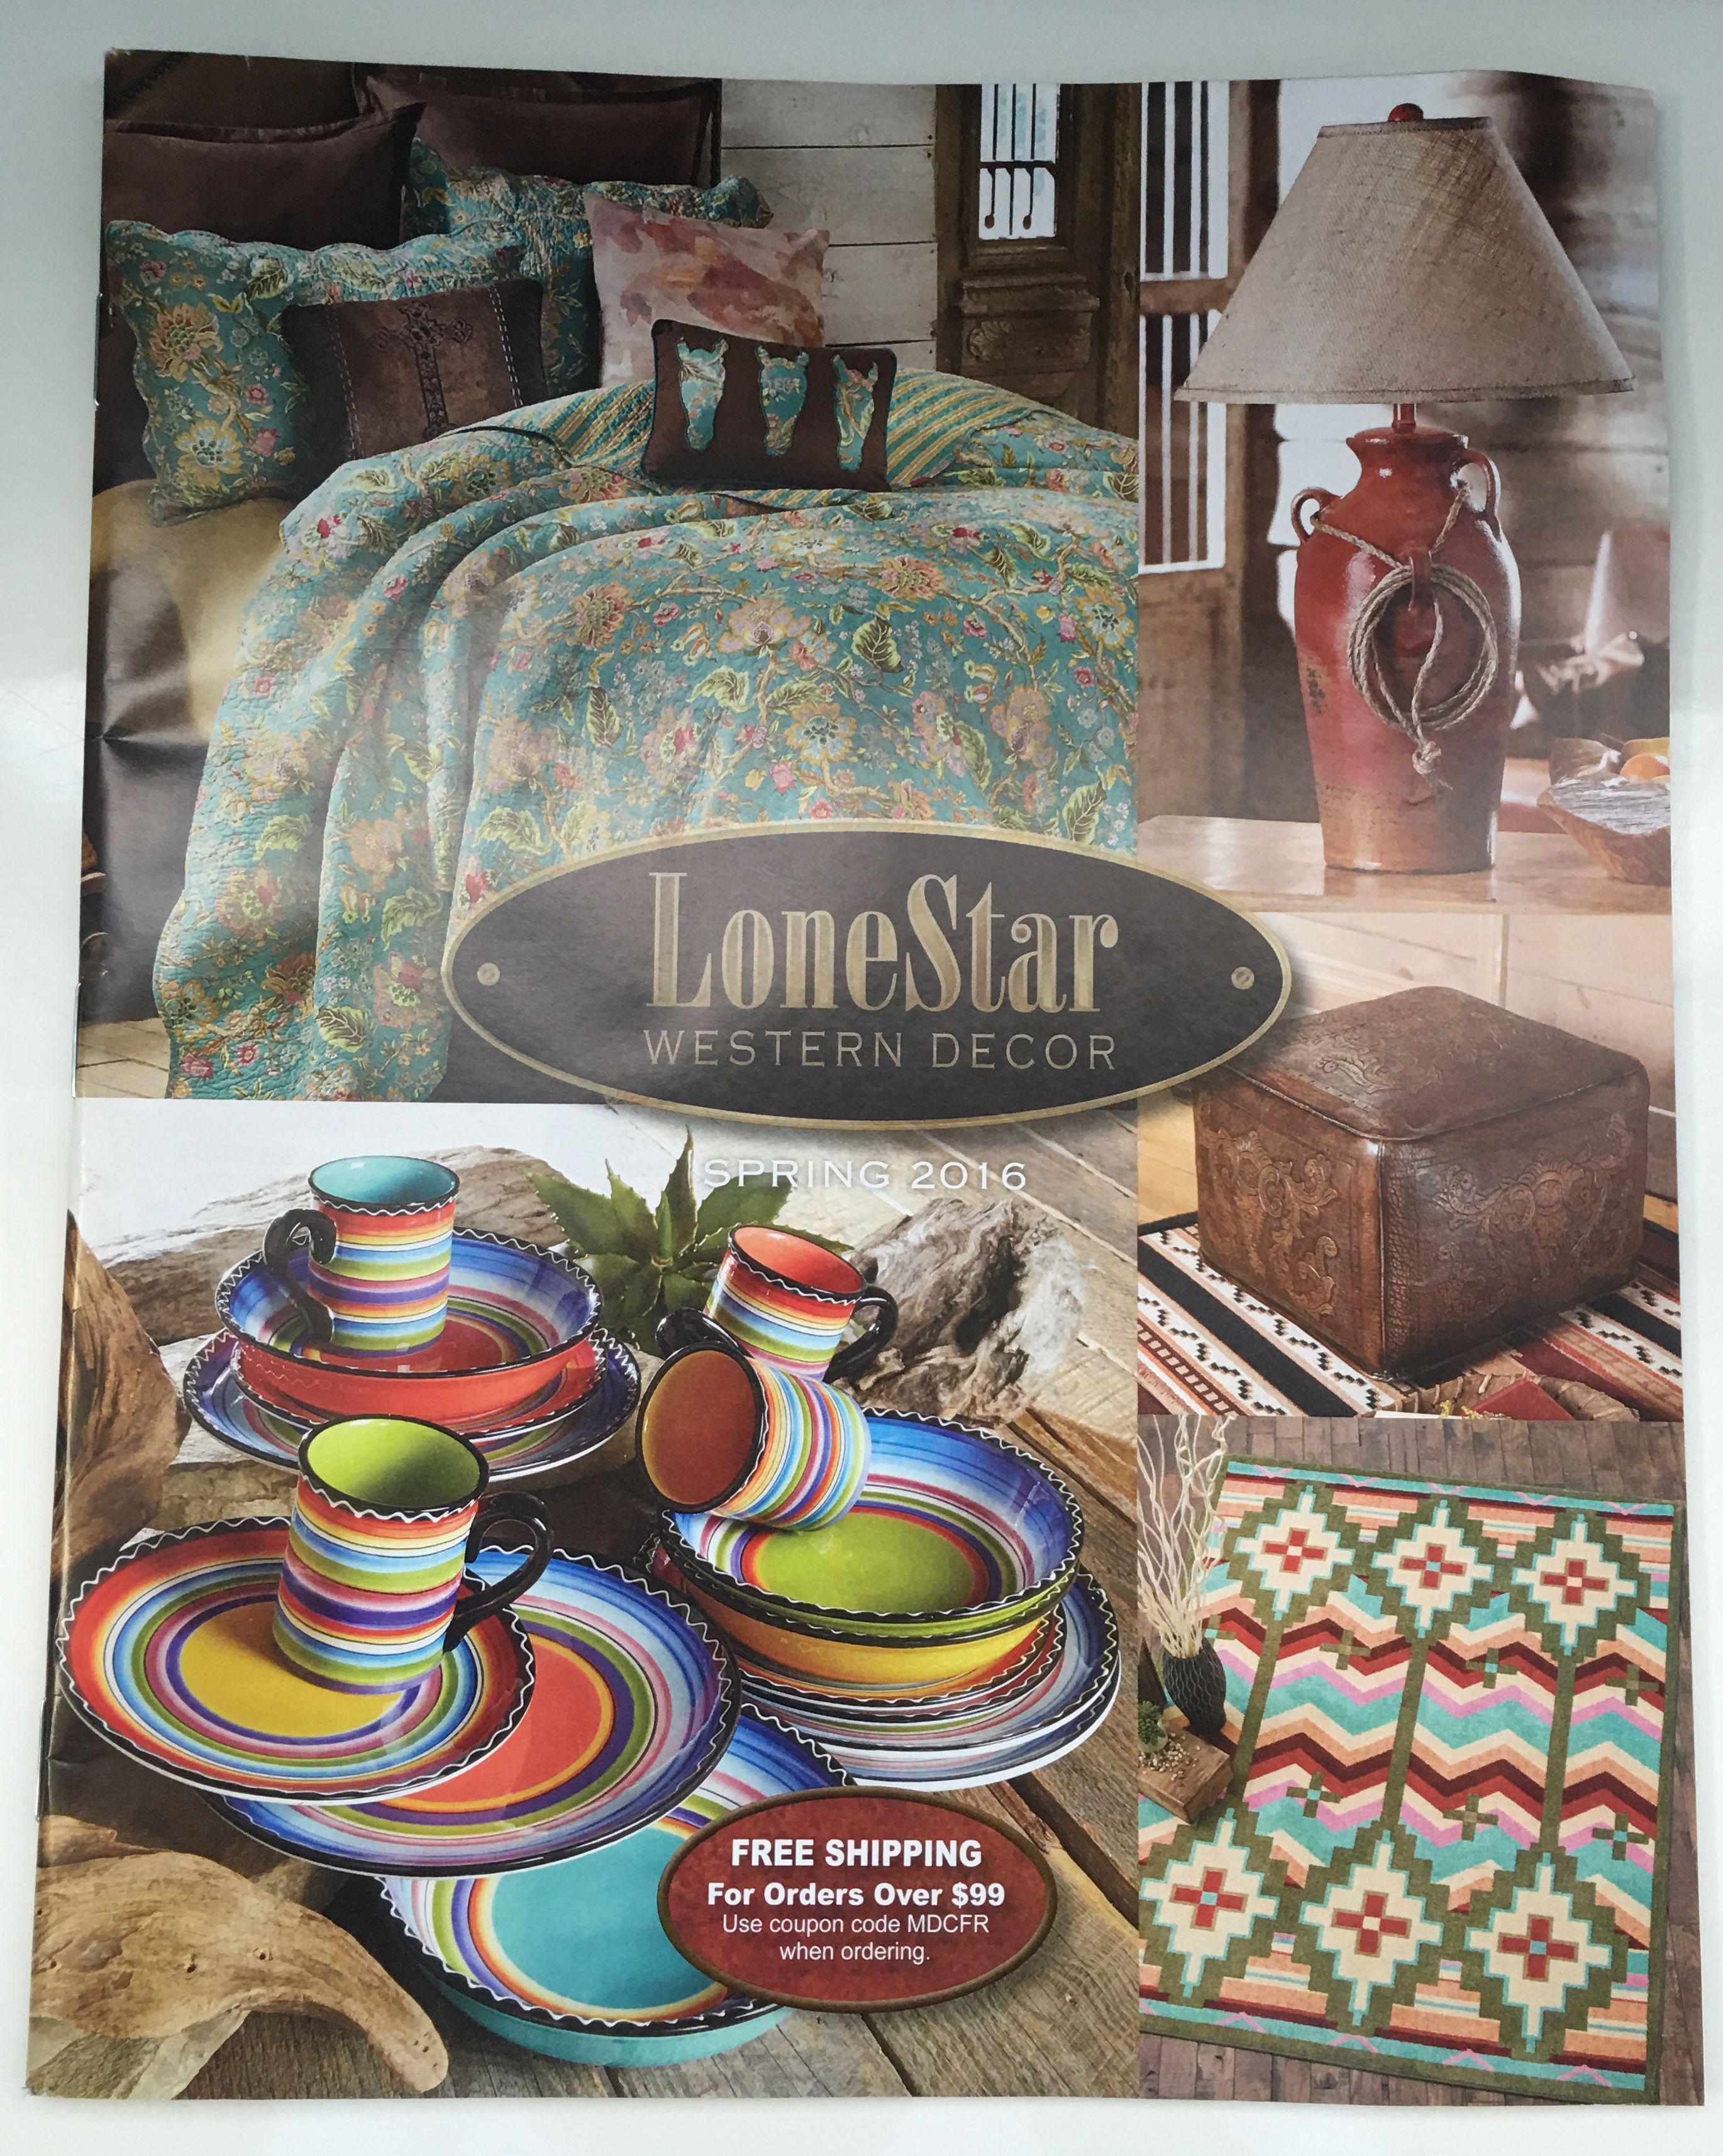 Request a Free Lonestar Western Decor Catalog